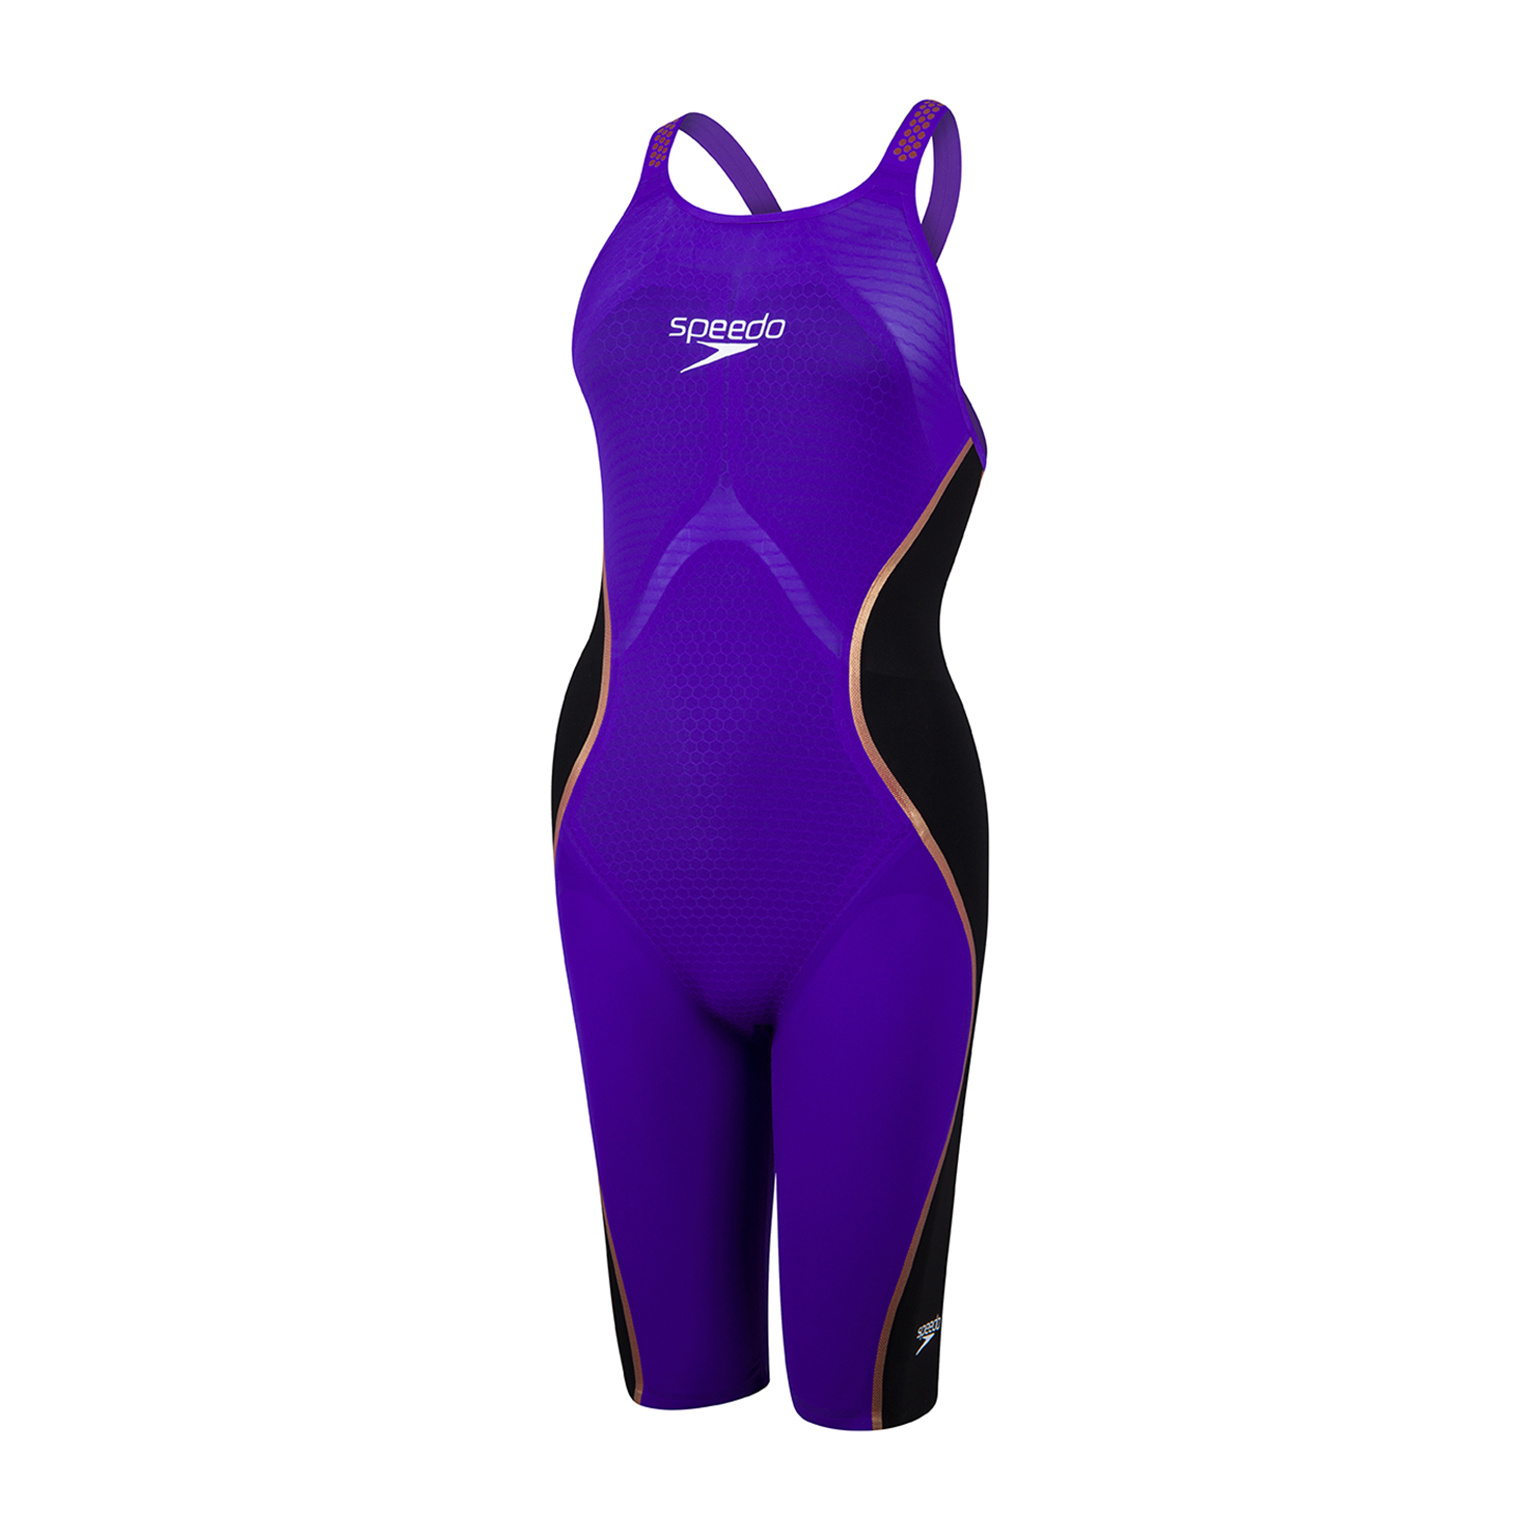 Speedo wedstrijdbadpak Pure Intent OB purple-black